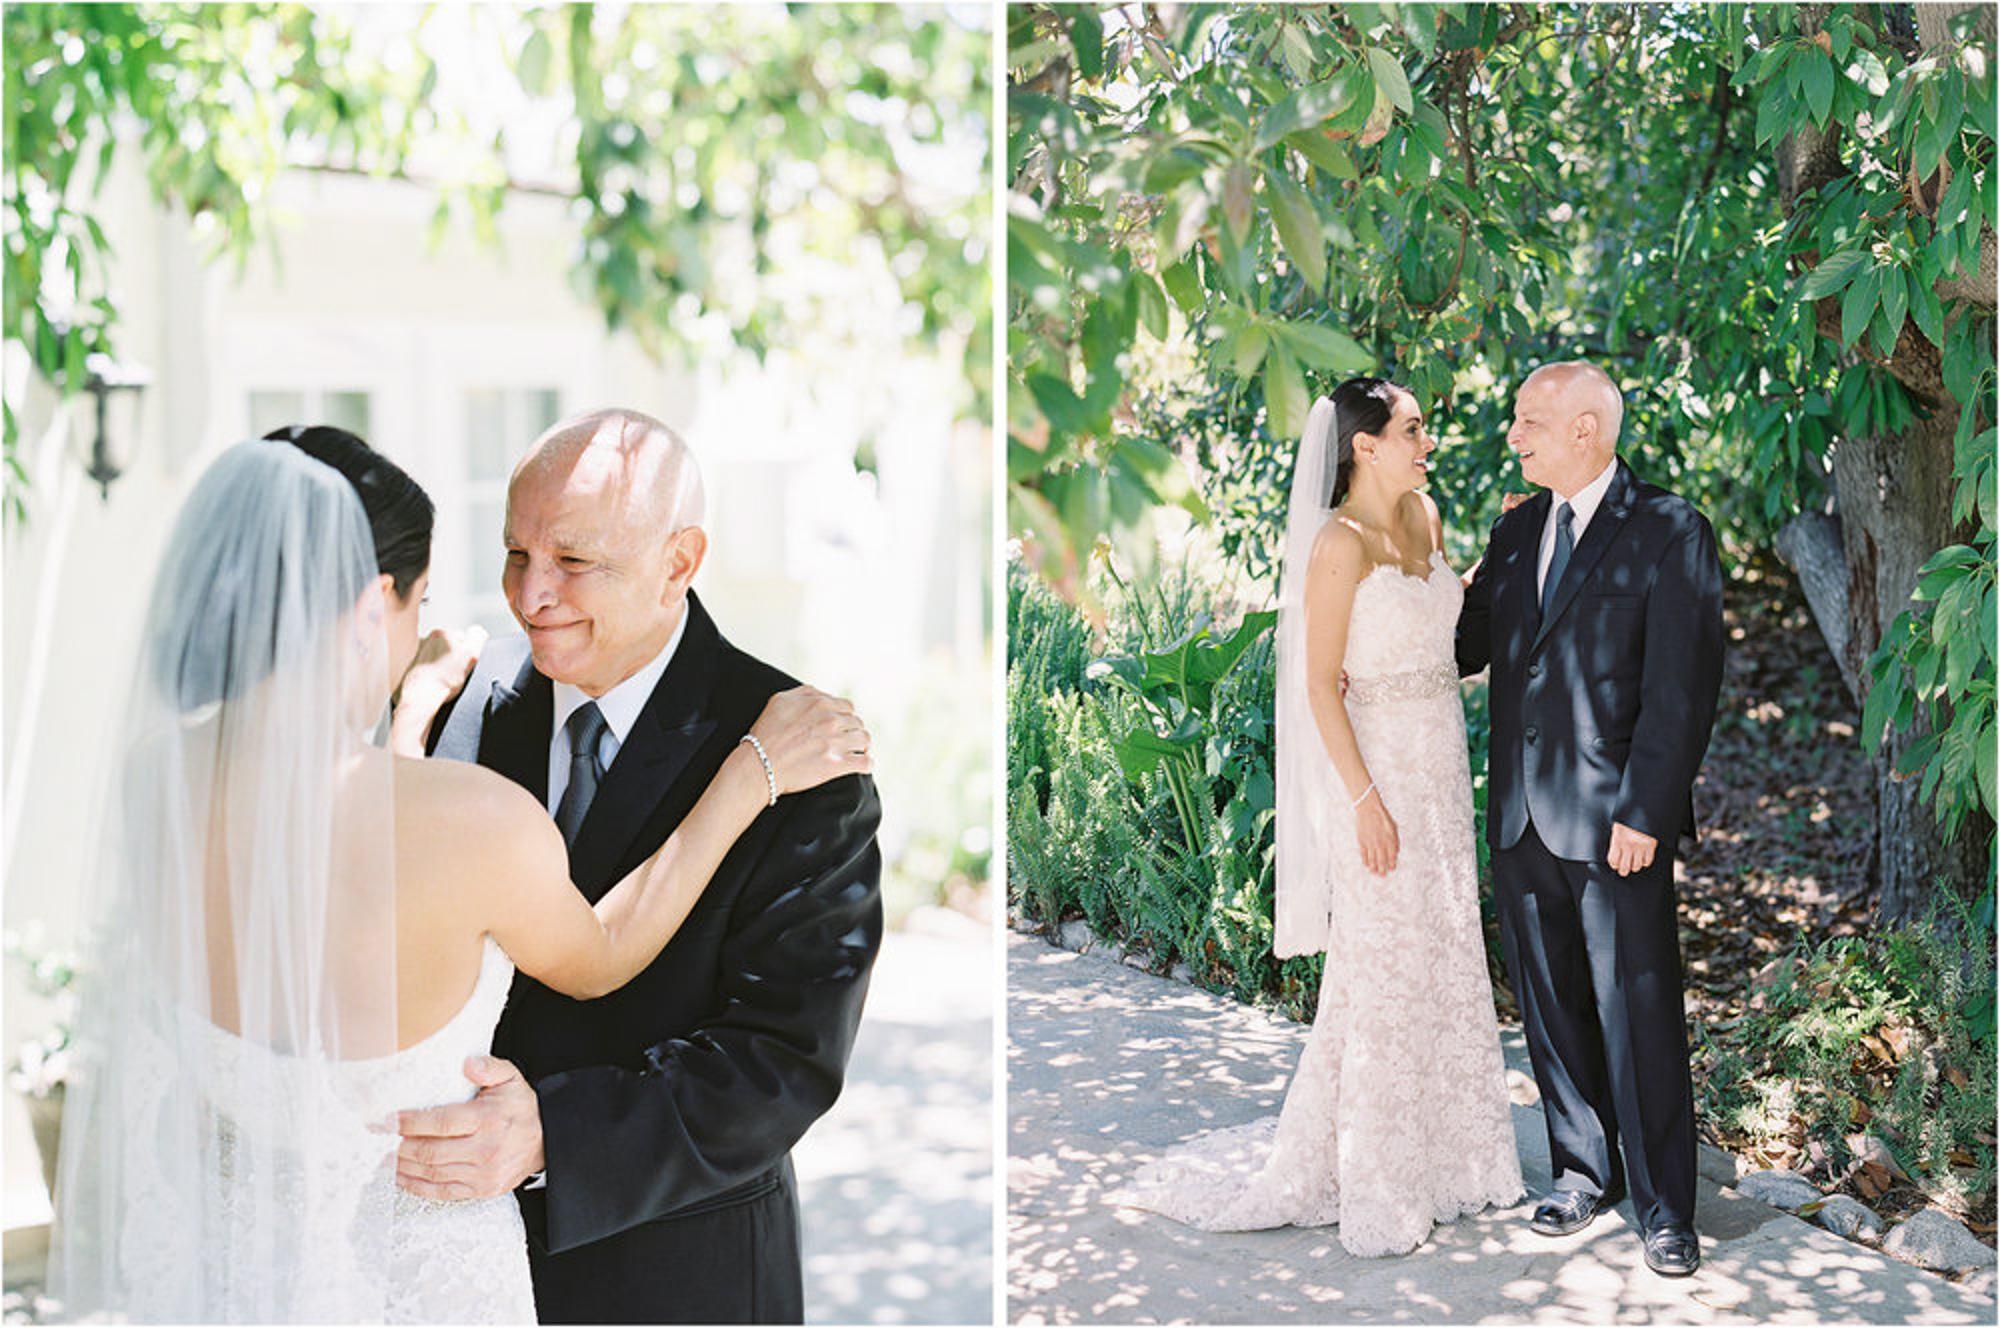 Gerry-Ranch-Wedding-Photography-Kristina-Adams-5.jpg